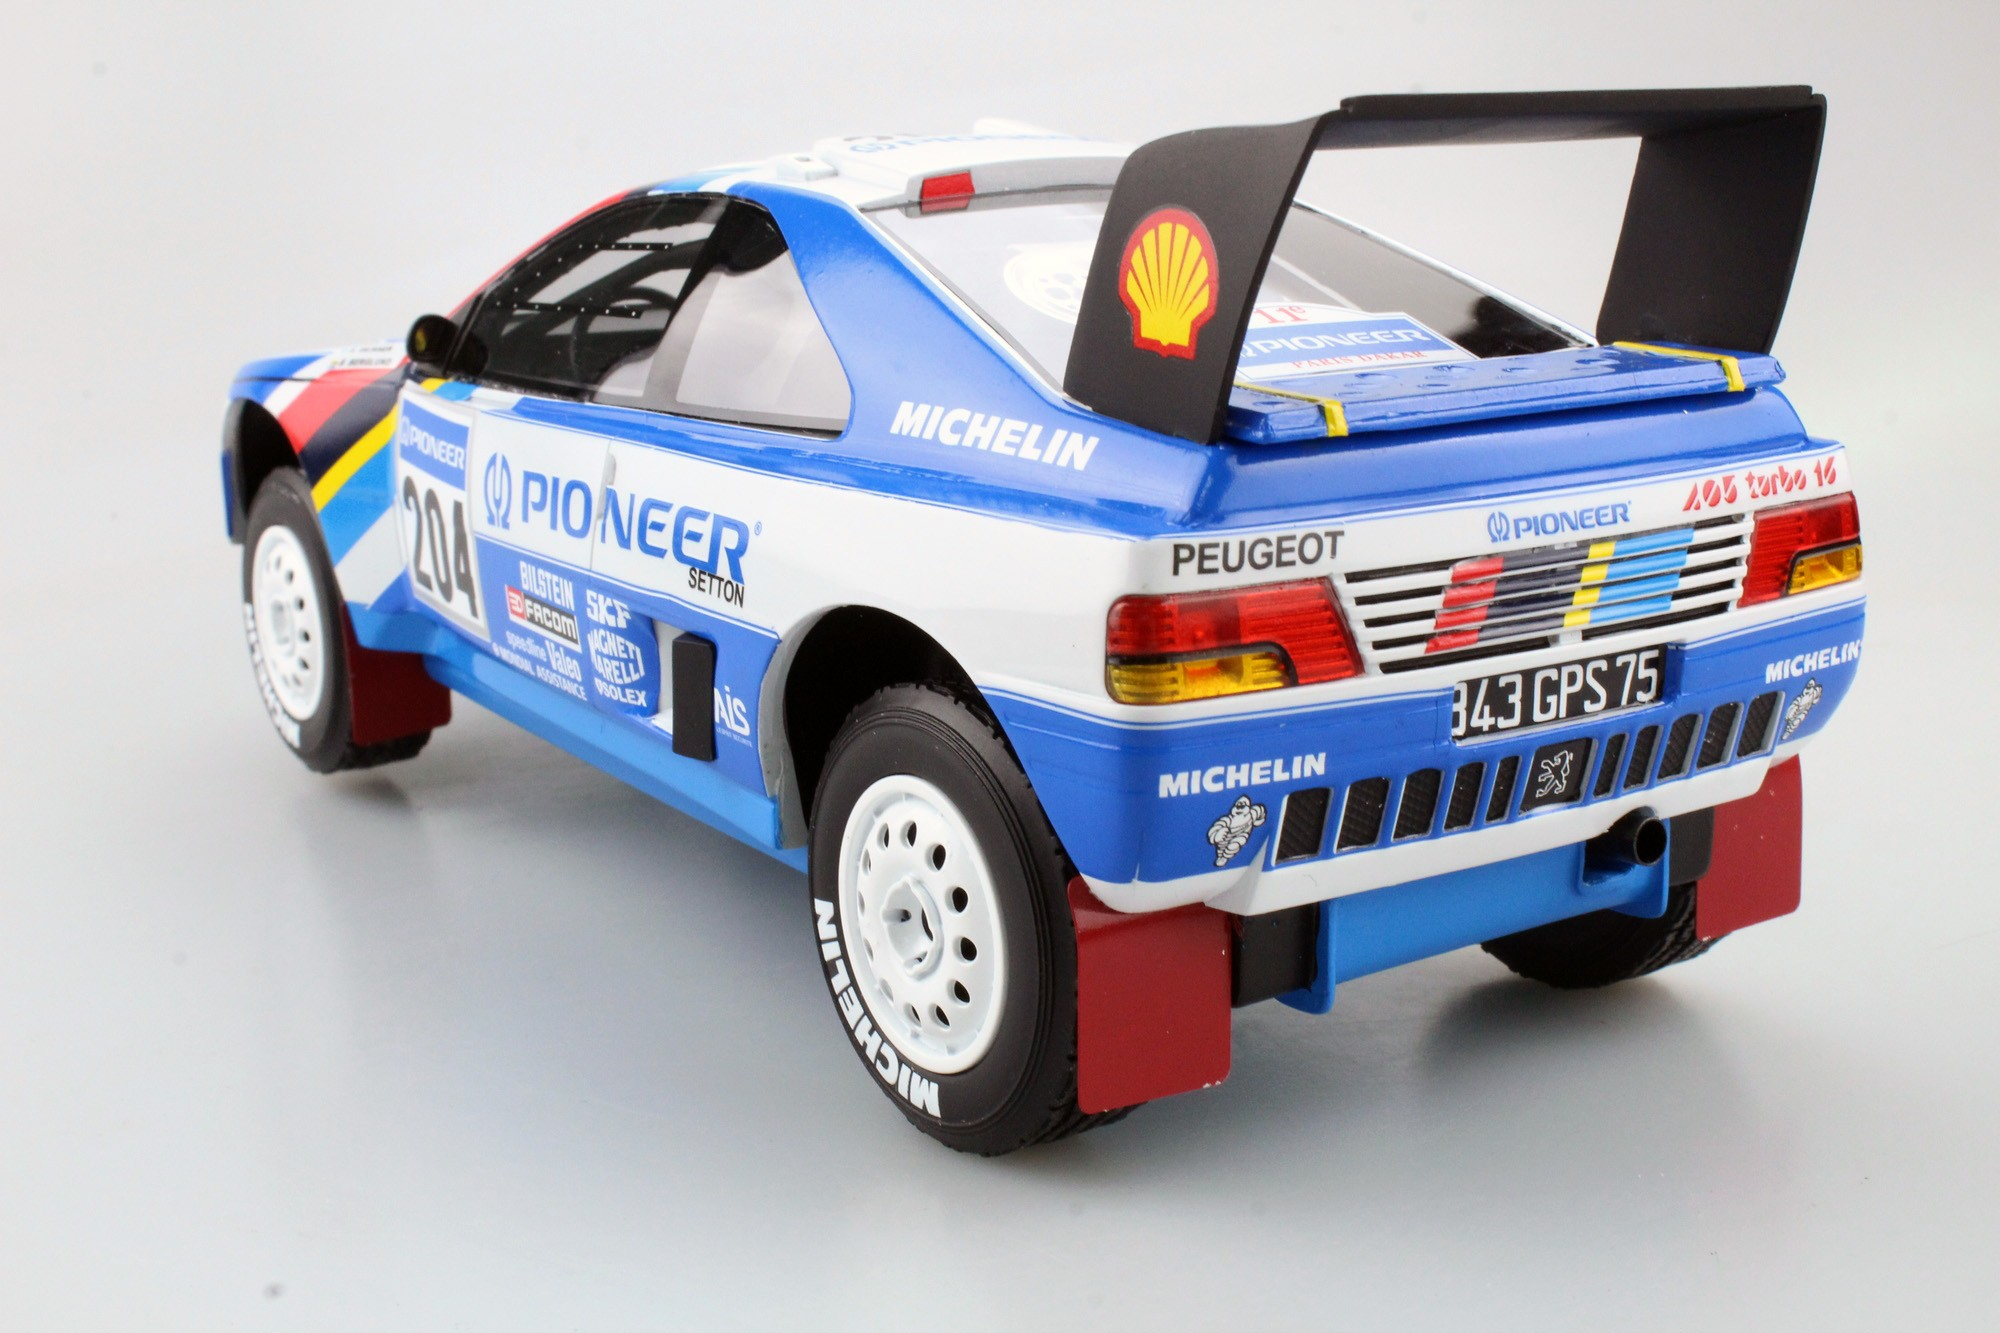 Top Marques Collectibles Peugeot 405 GT T 16 Paris Dakar Winner 1989